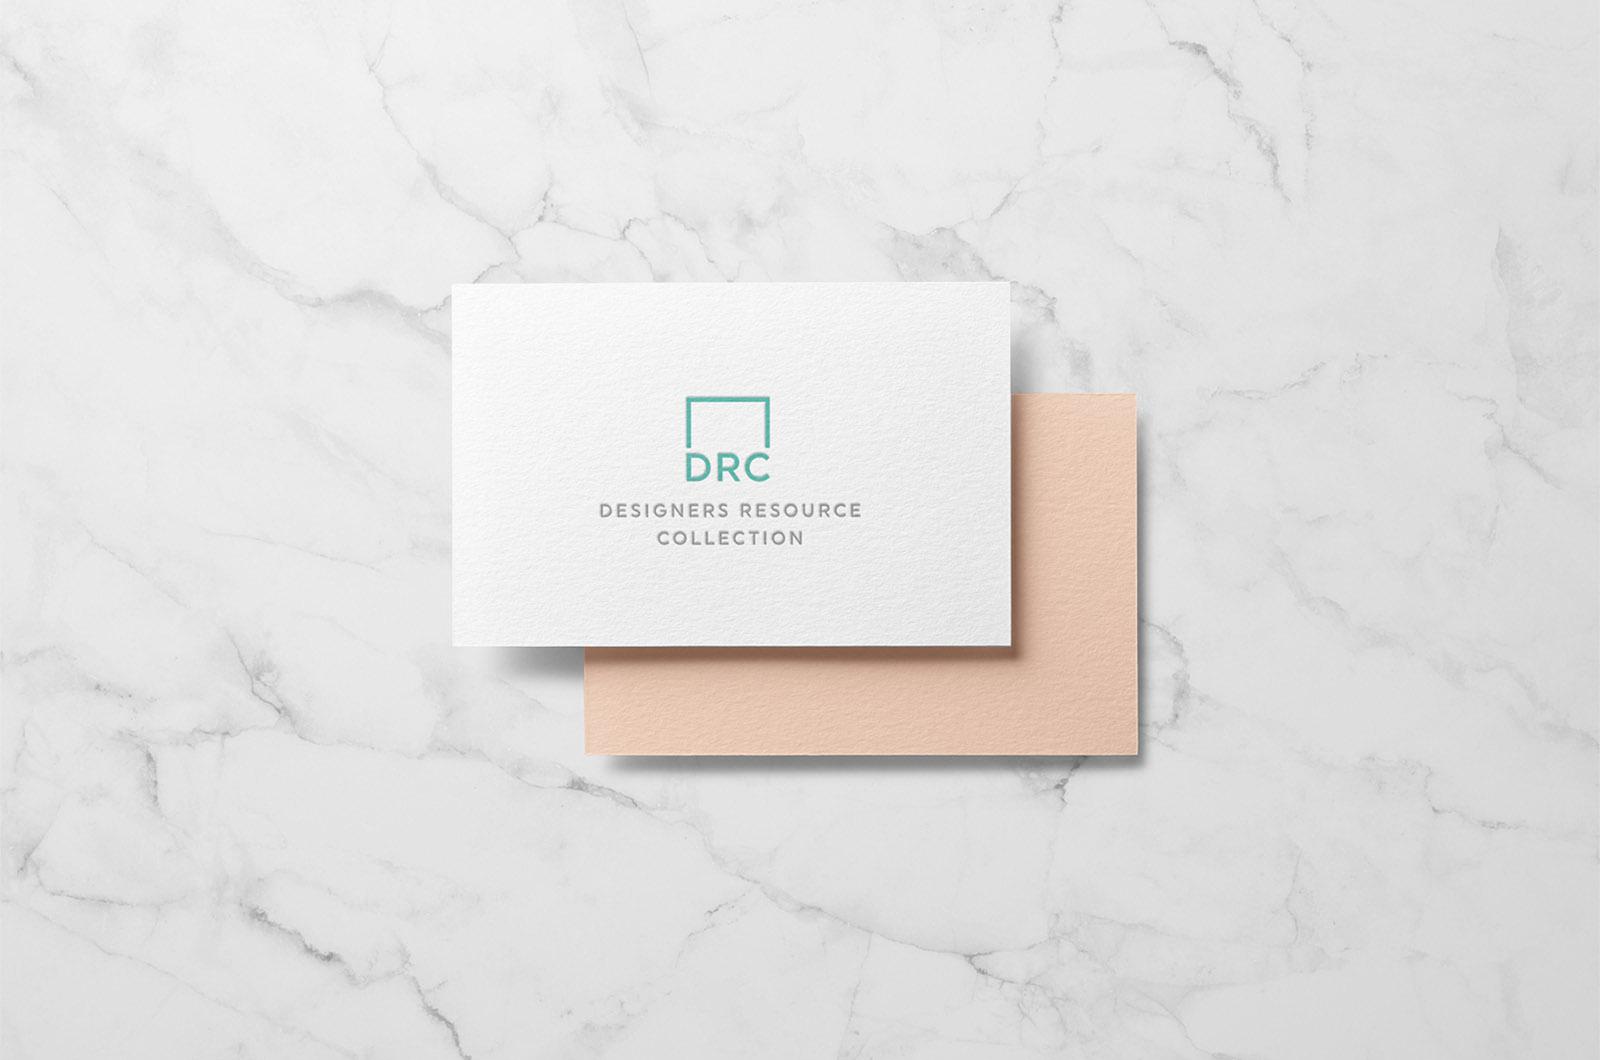 drc-interior-designer-company-branding_03.jpg